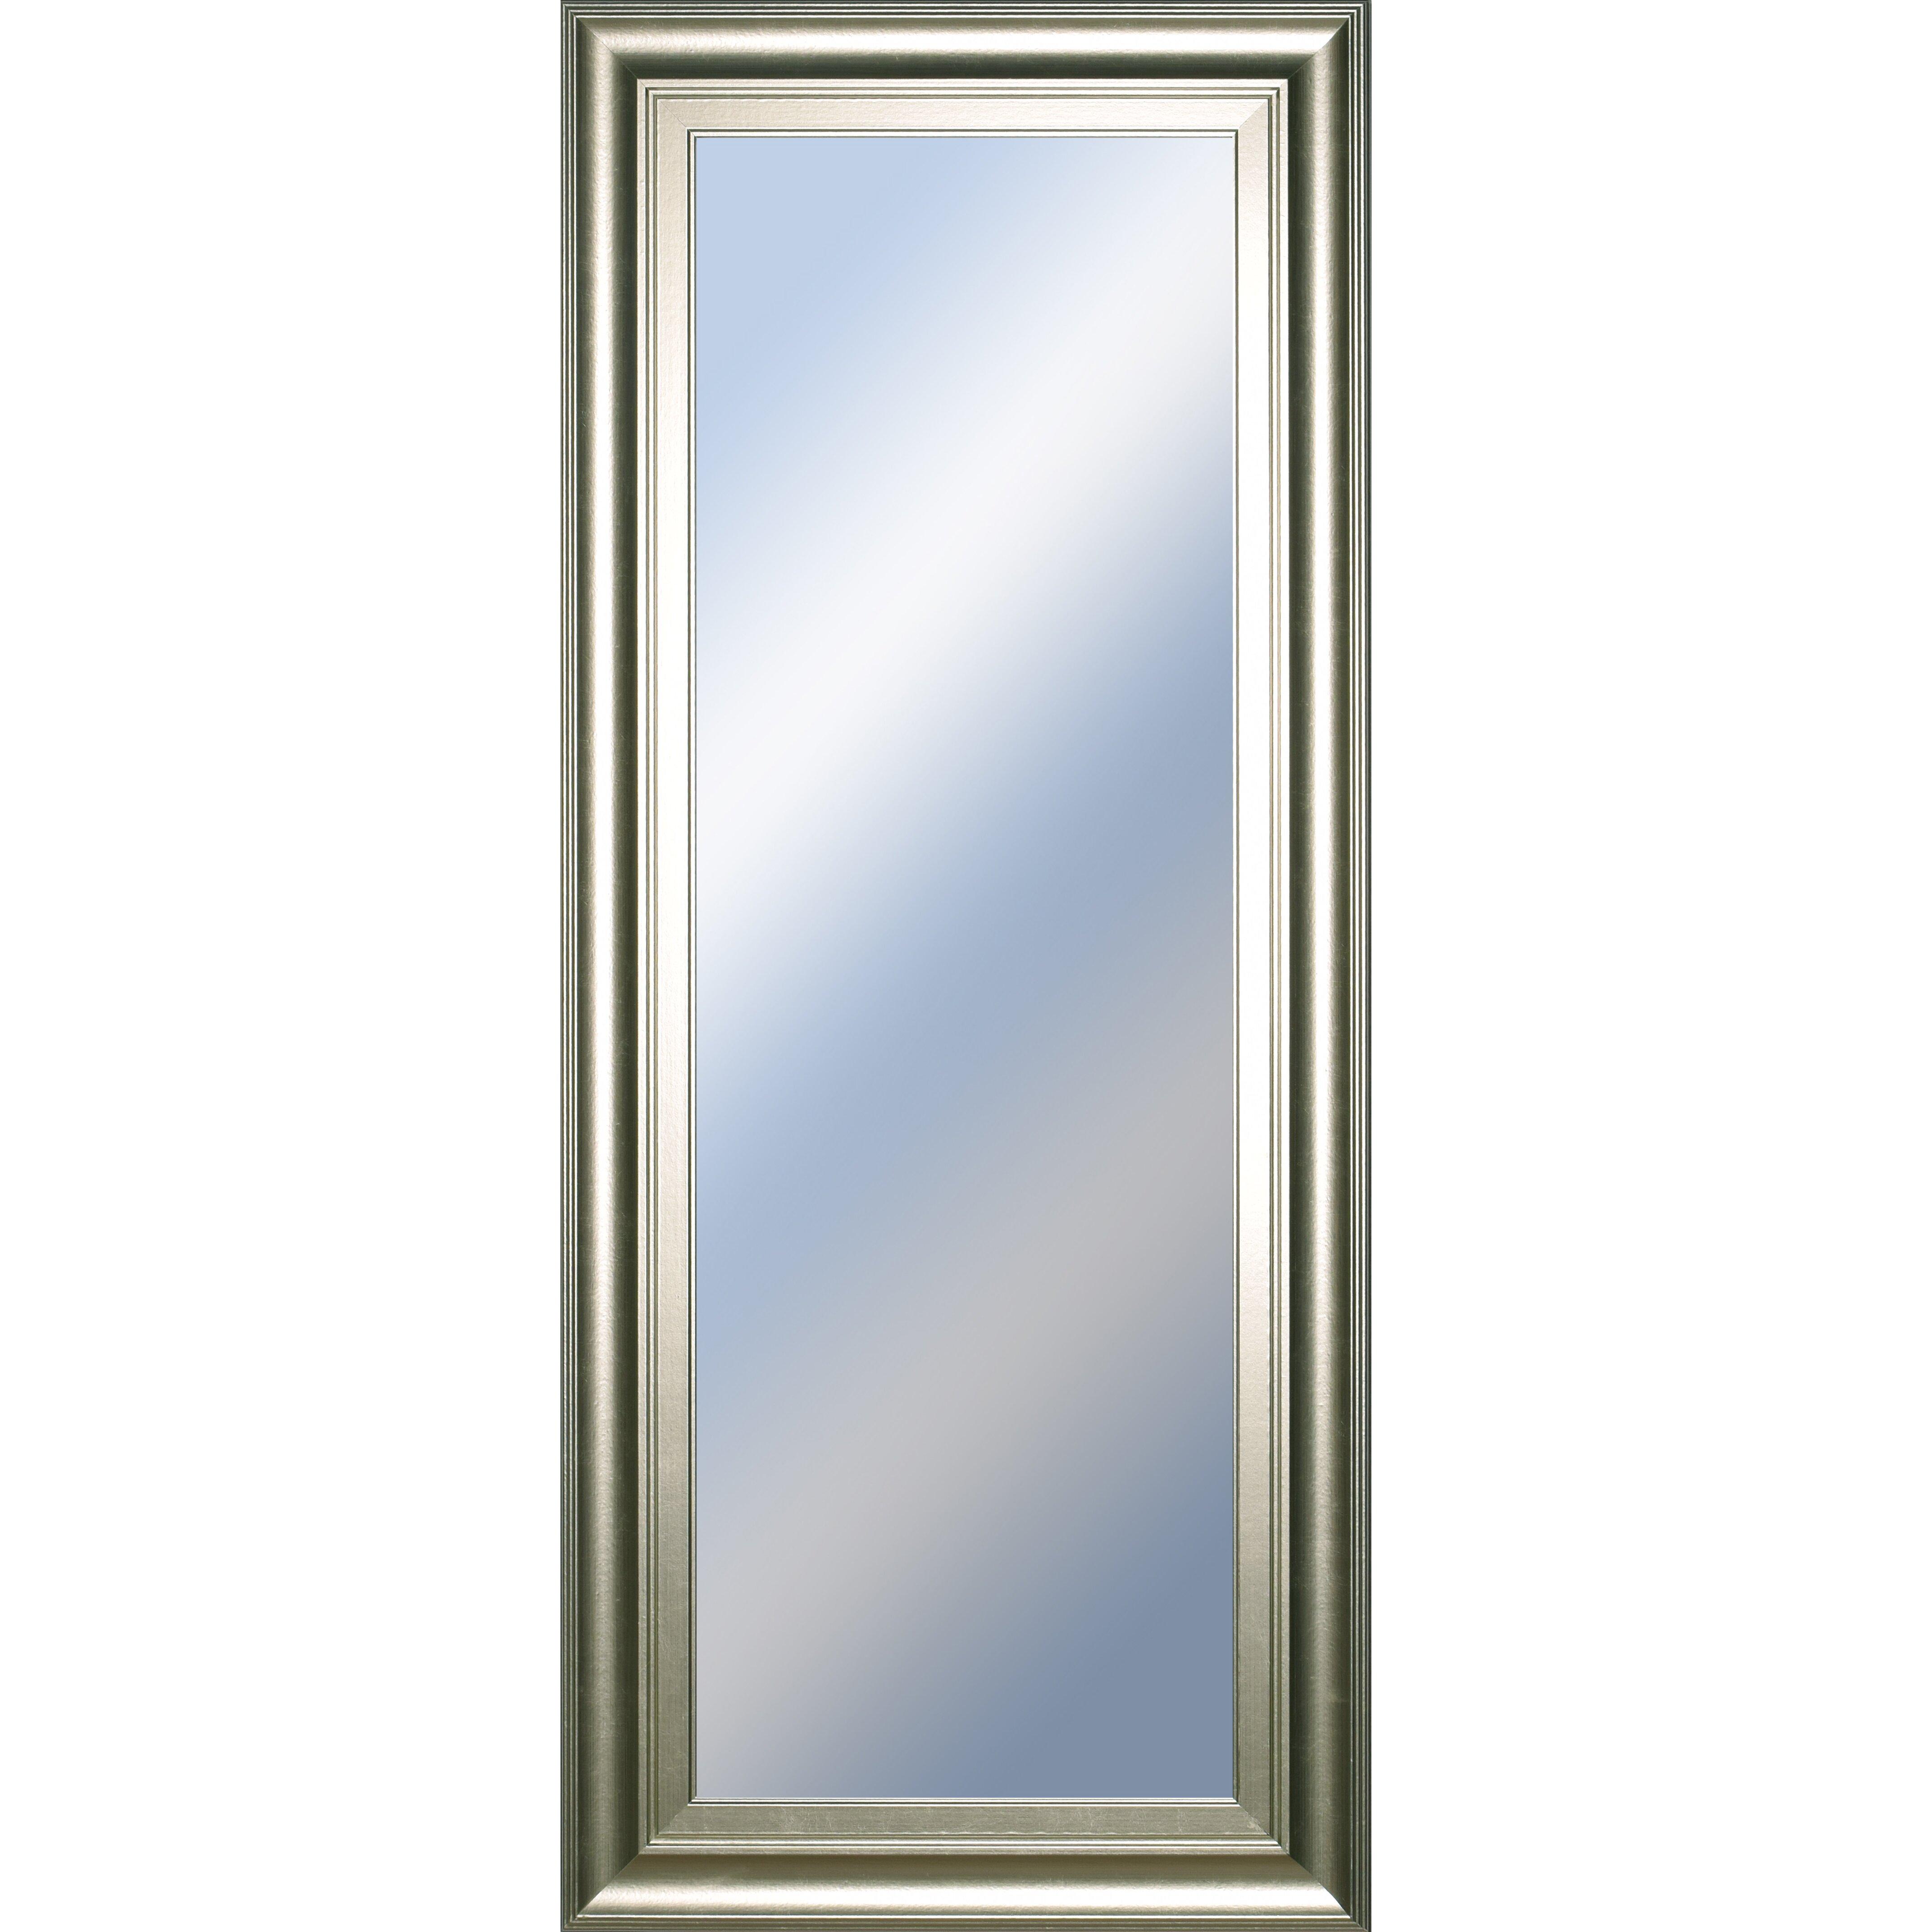 classy art wholesalers decorative framed wall mirror